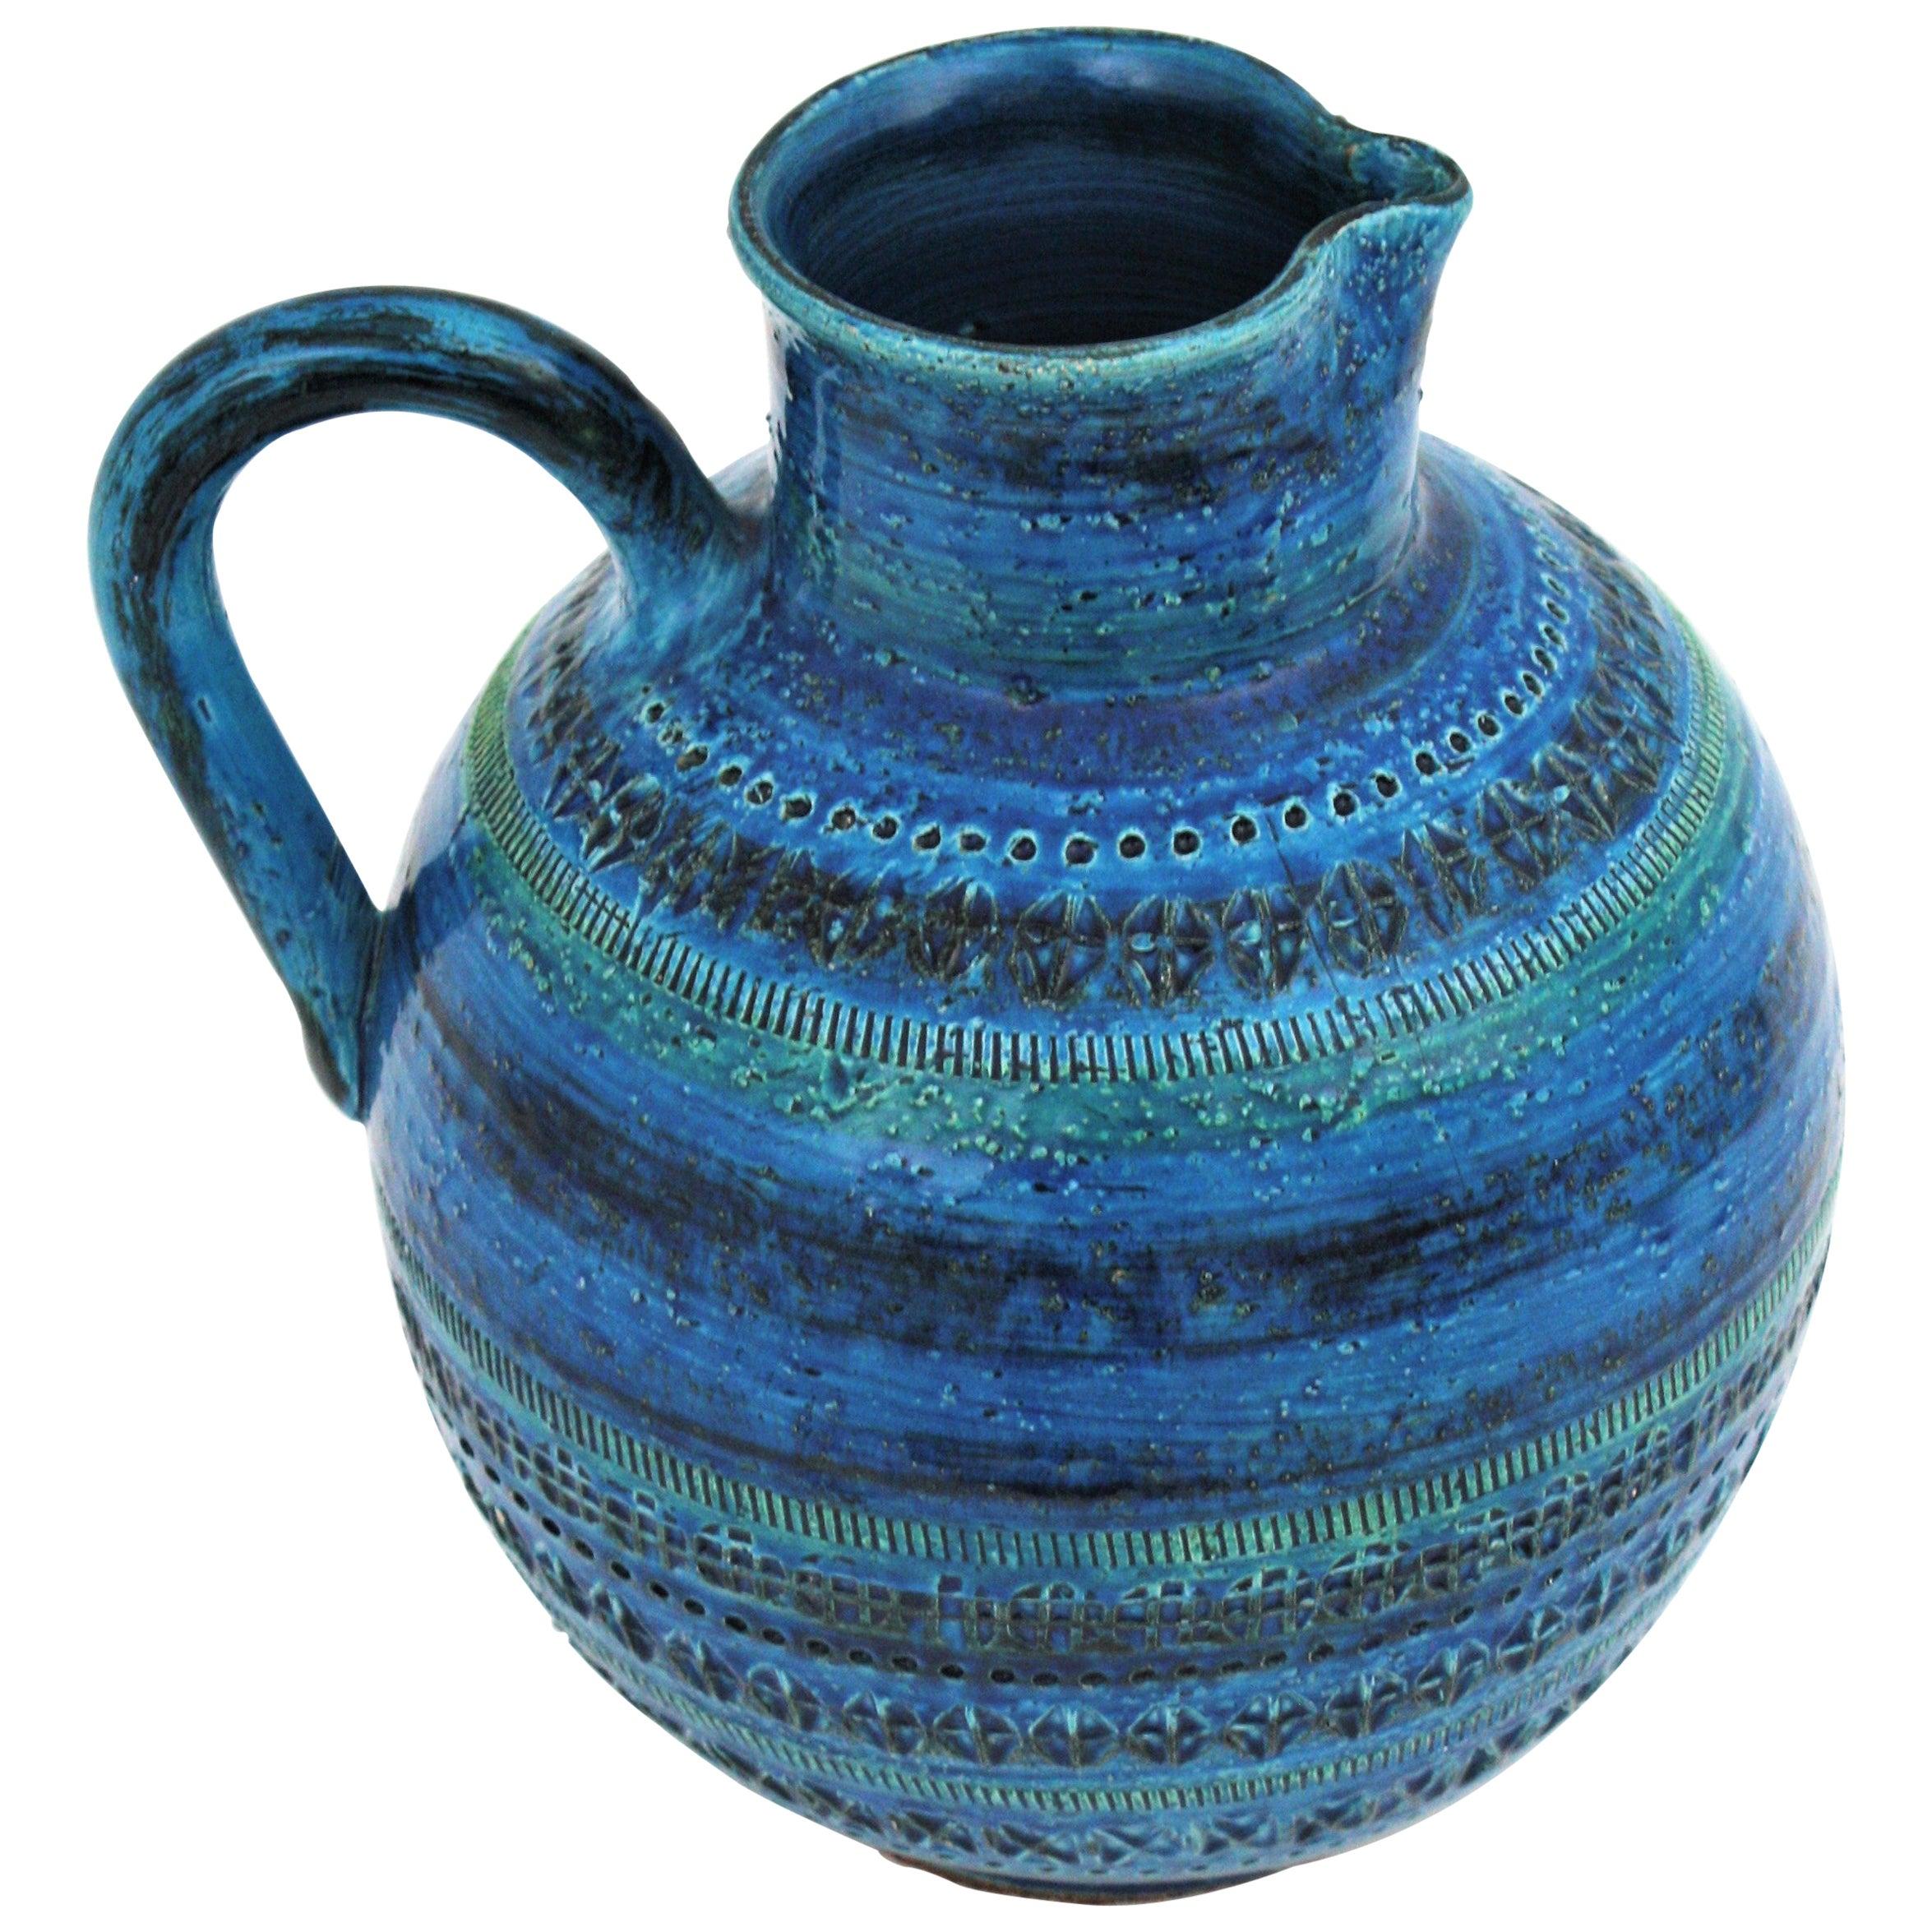 Aldo Londi Bitossi Rimini Blue Glazed Ceramic Oversized Jug Vase